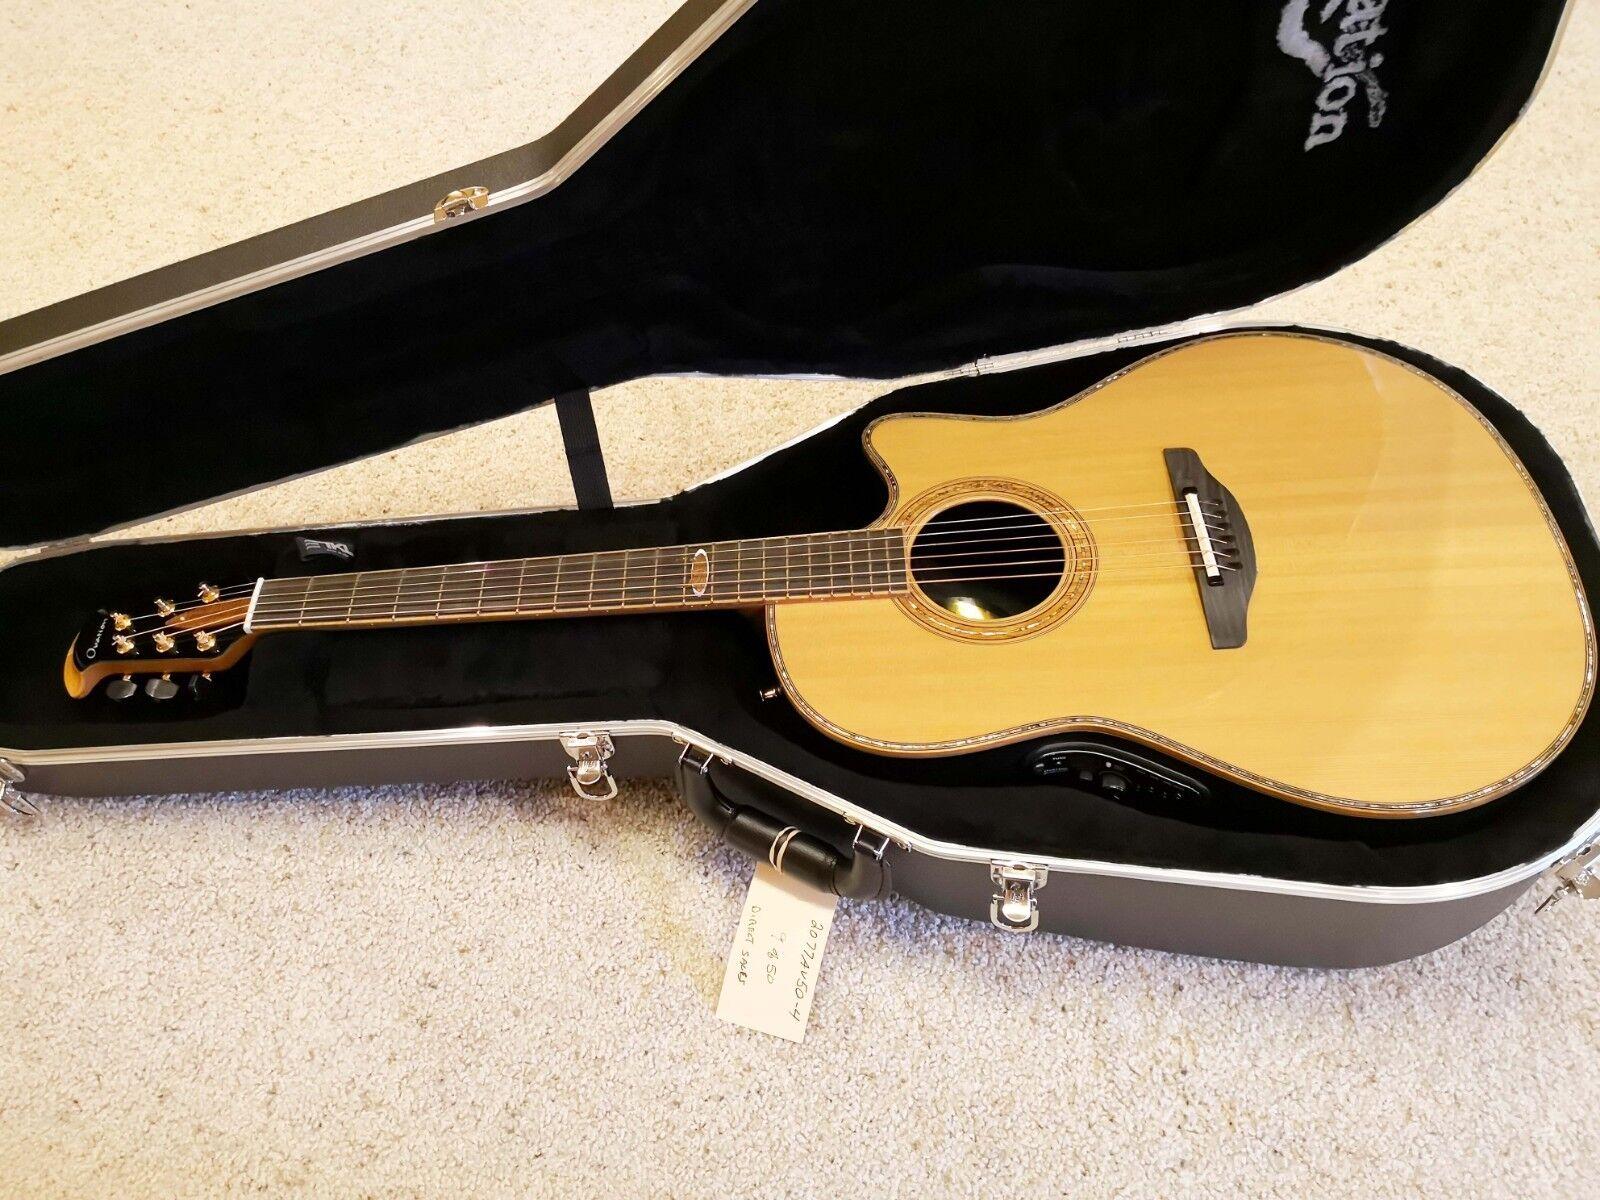 New Ovation 2077AV50-4 50th Anniversary Custom Legend Acoustic-Electric Guitar